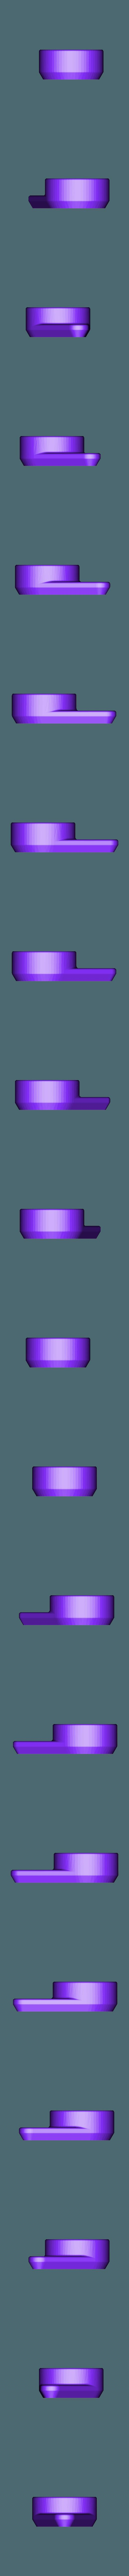 came.STL Download free STL file Cam for Creality ender 3 extruder • Design to 3D print, SG3D